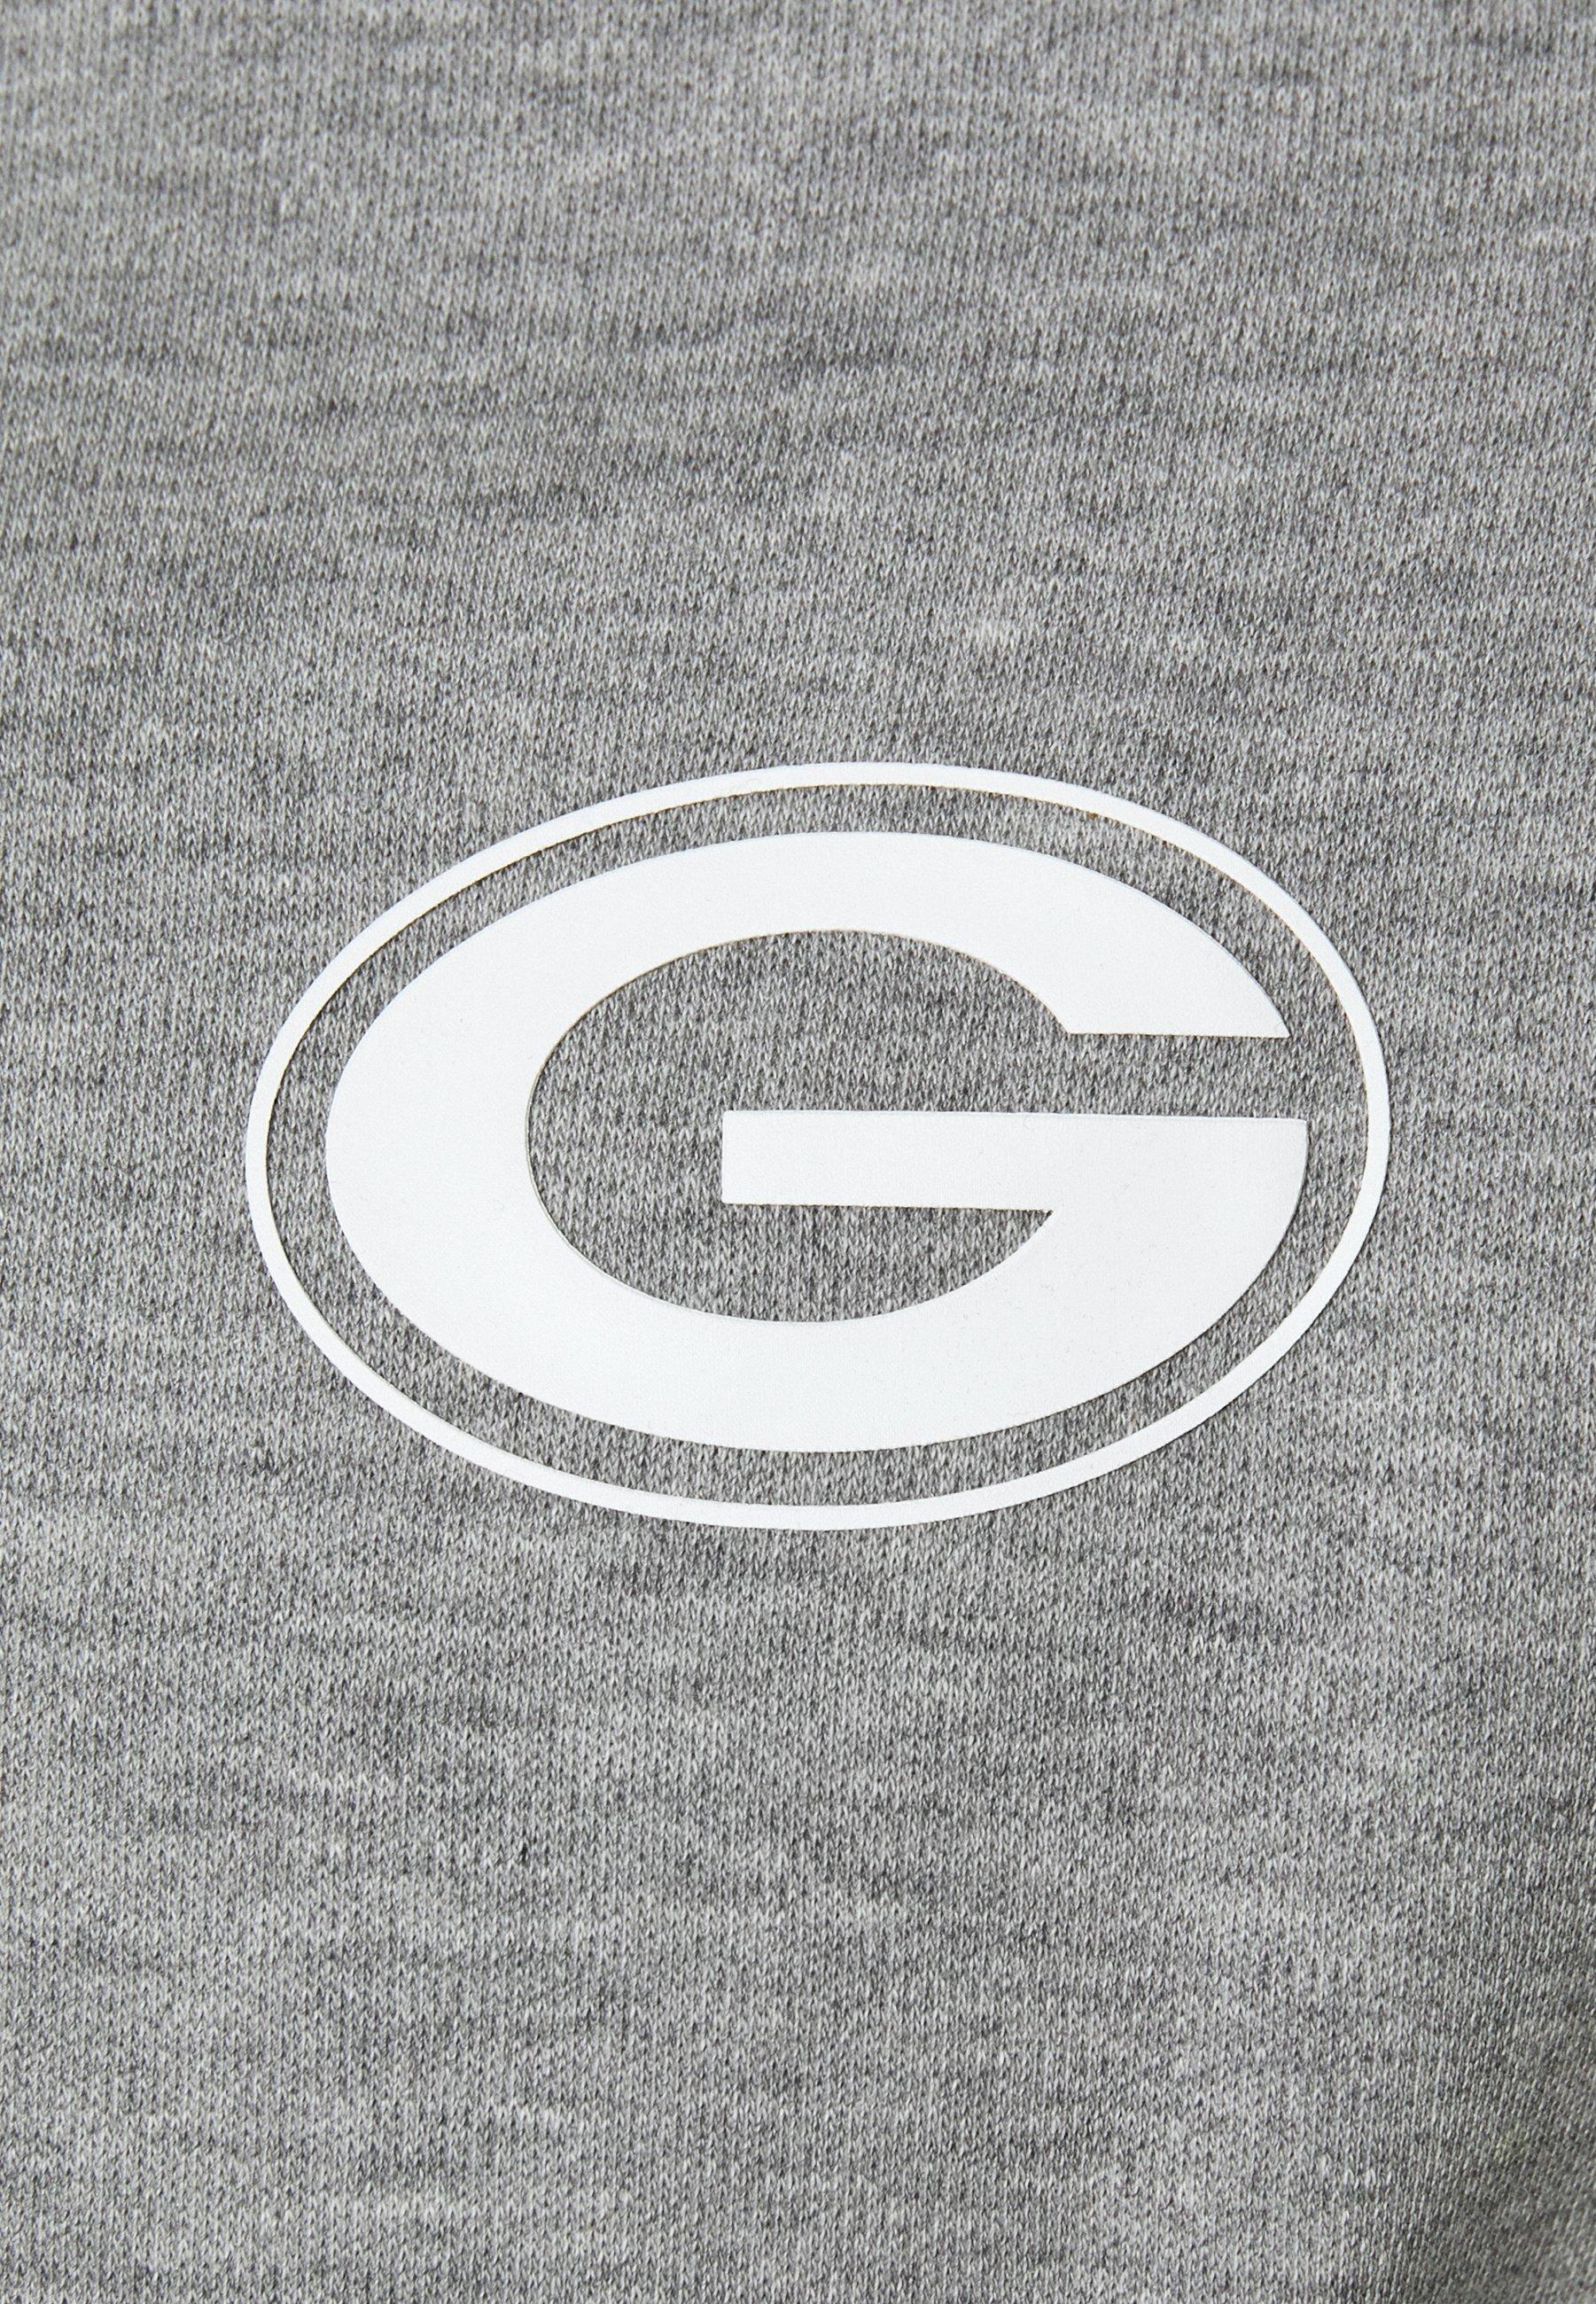 New Era Nfl Colour Block Hoody Green Bay Packers - Club Wear Grey